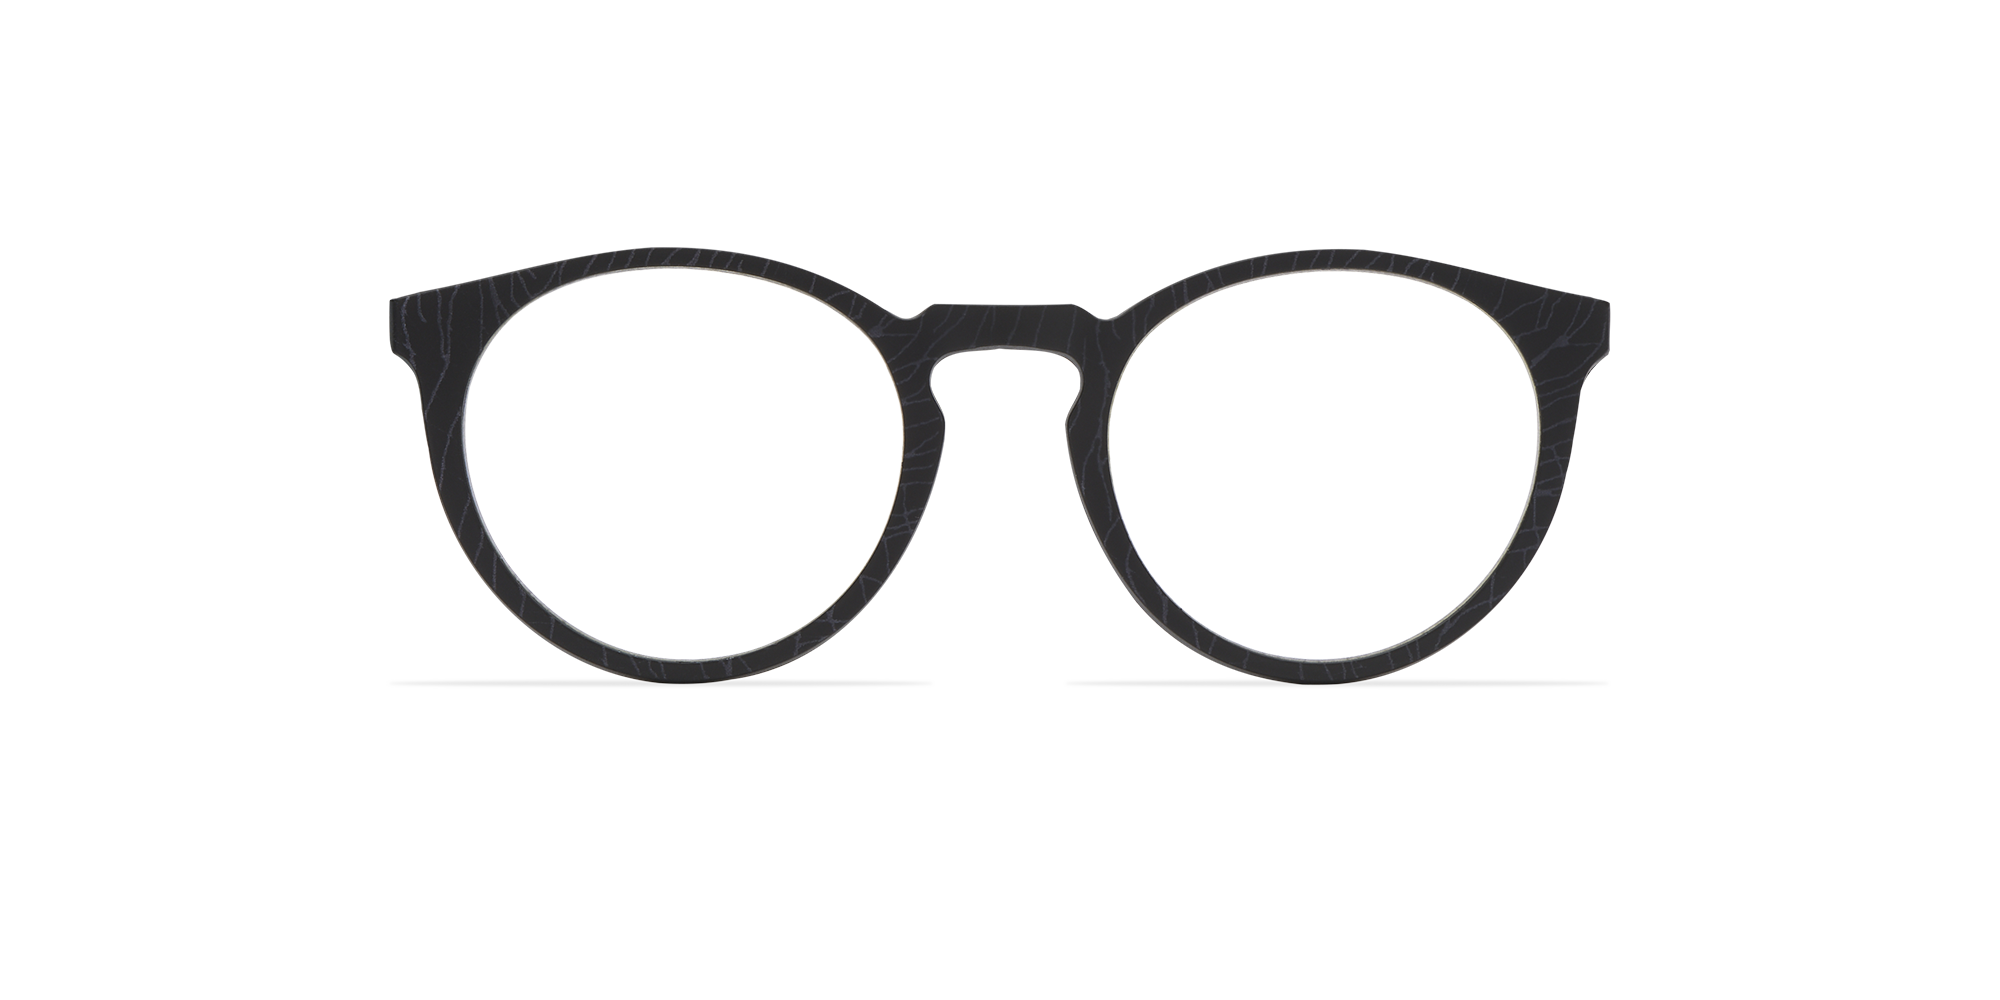 afflelou/france/products/smart_clip/clips_glasses/TMK35BBBK014820.png